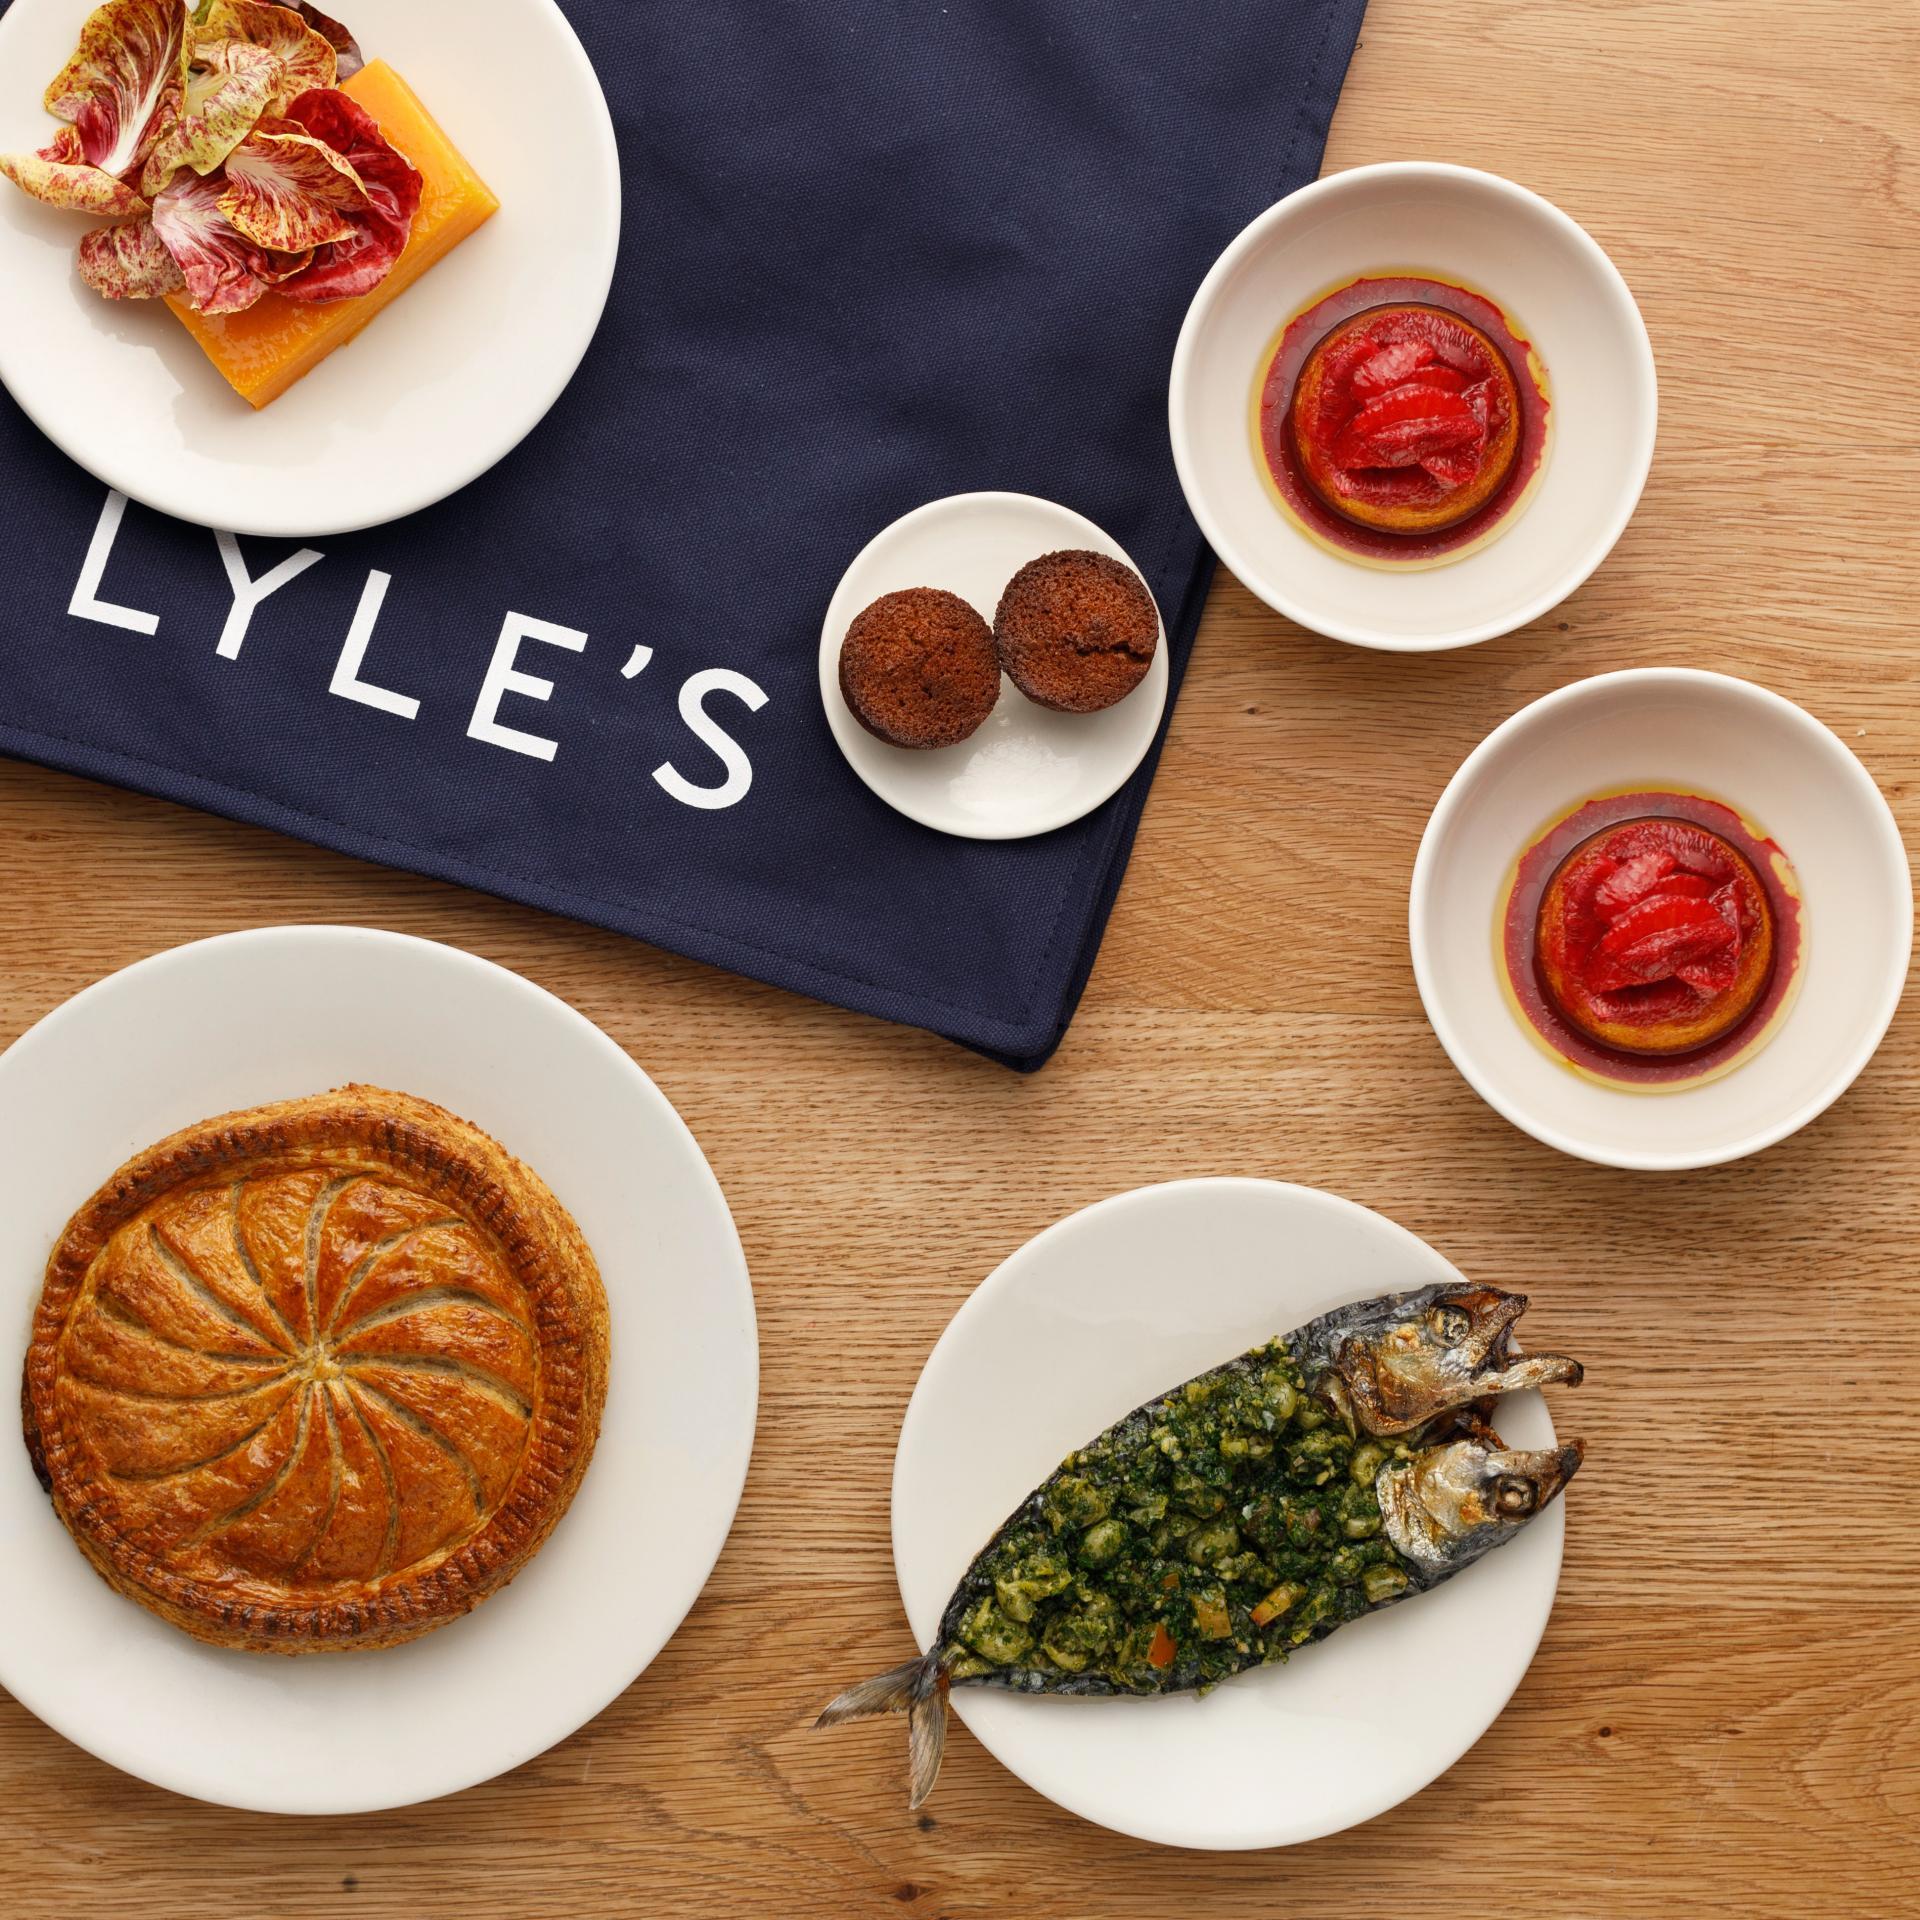 Lyle's mid week meal kit